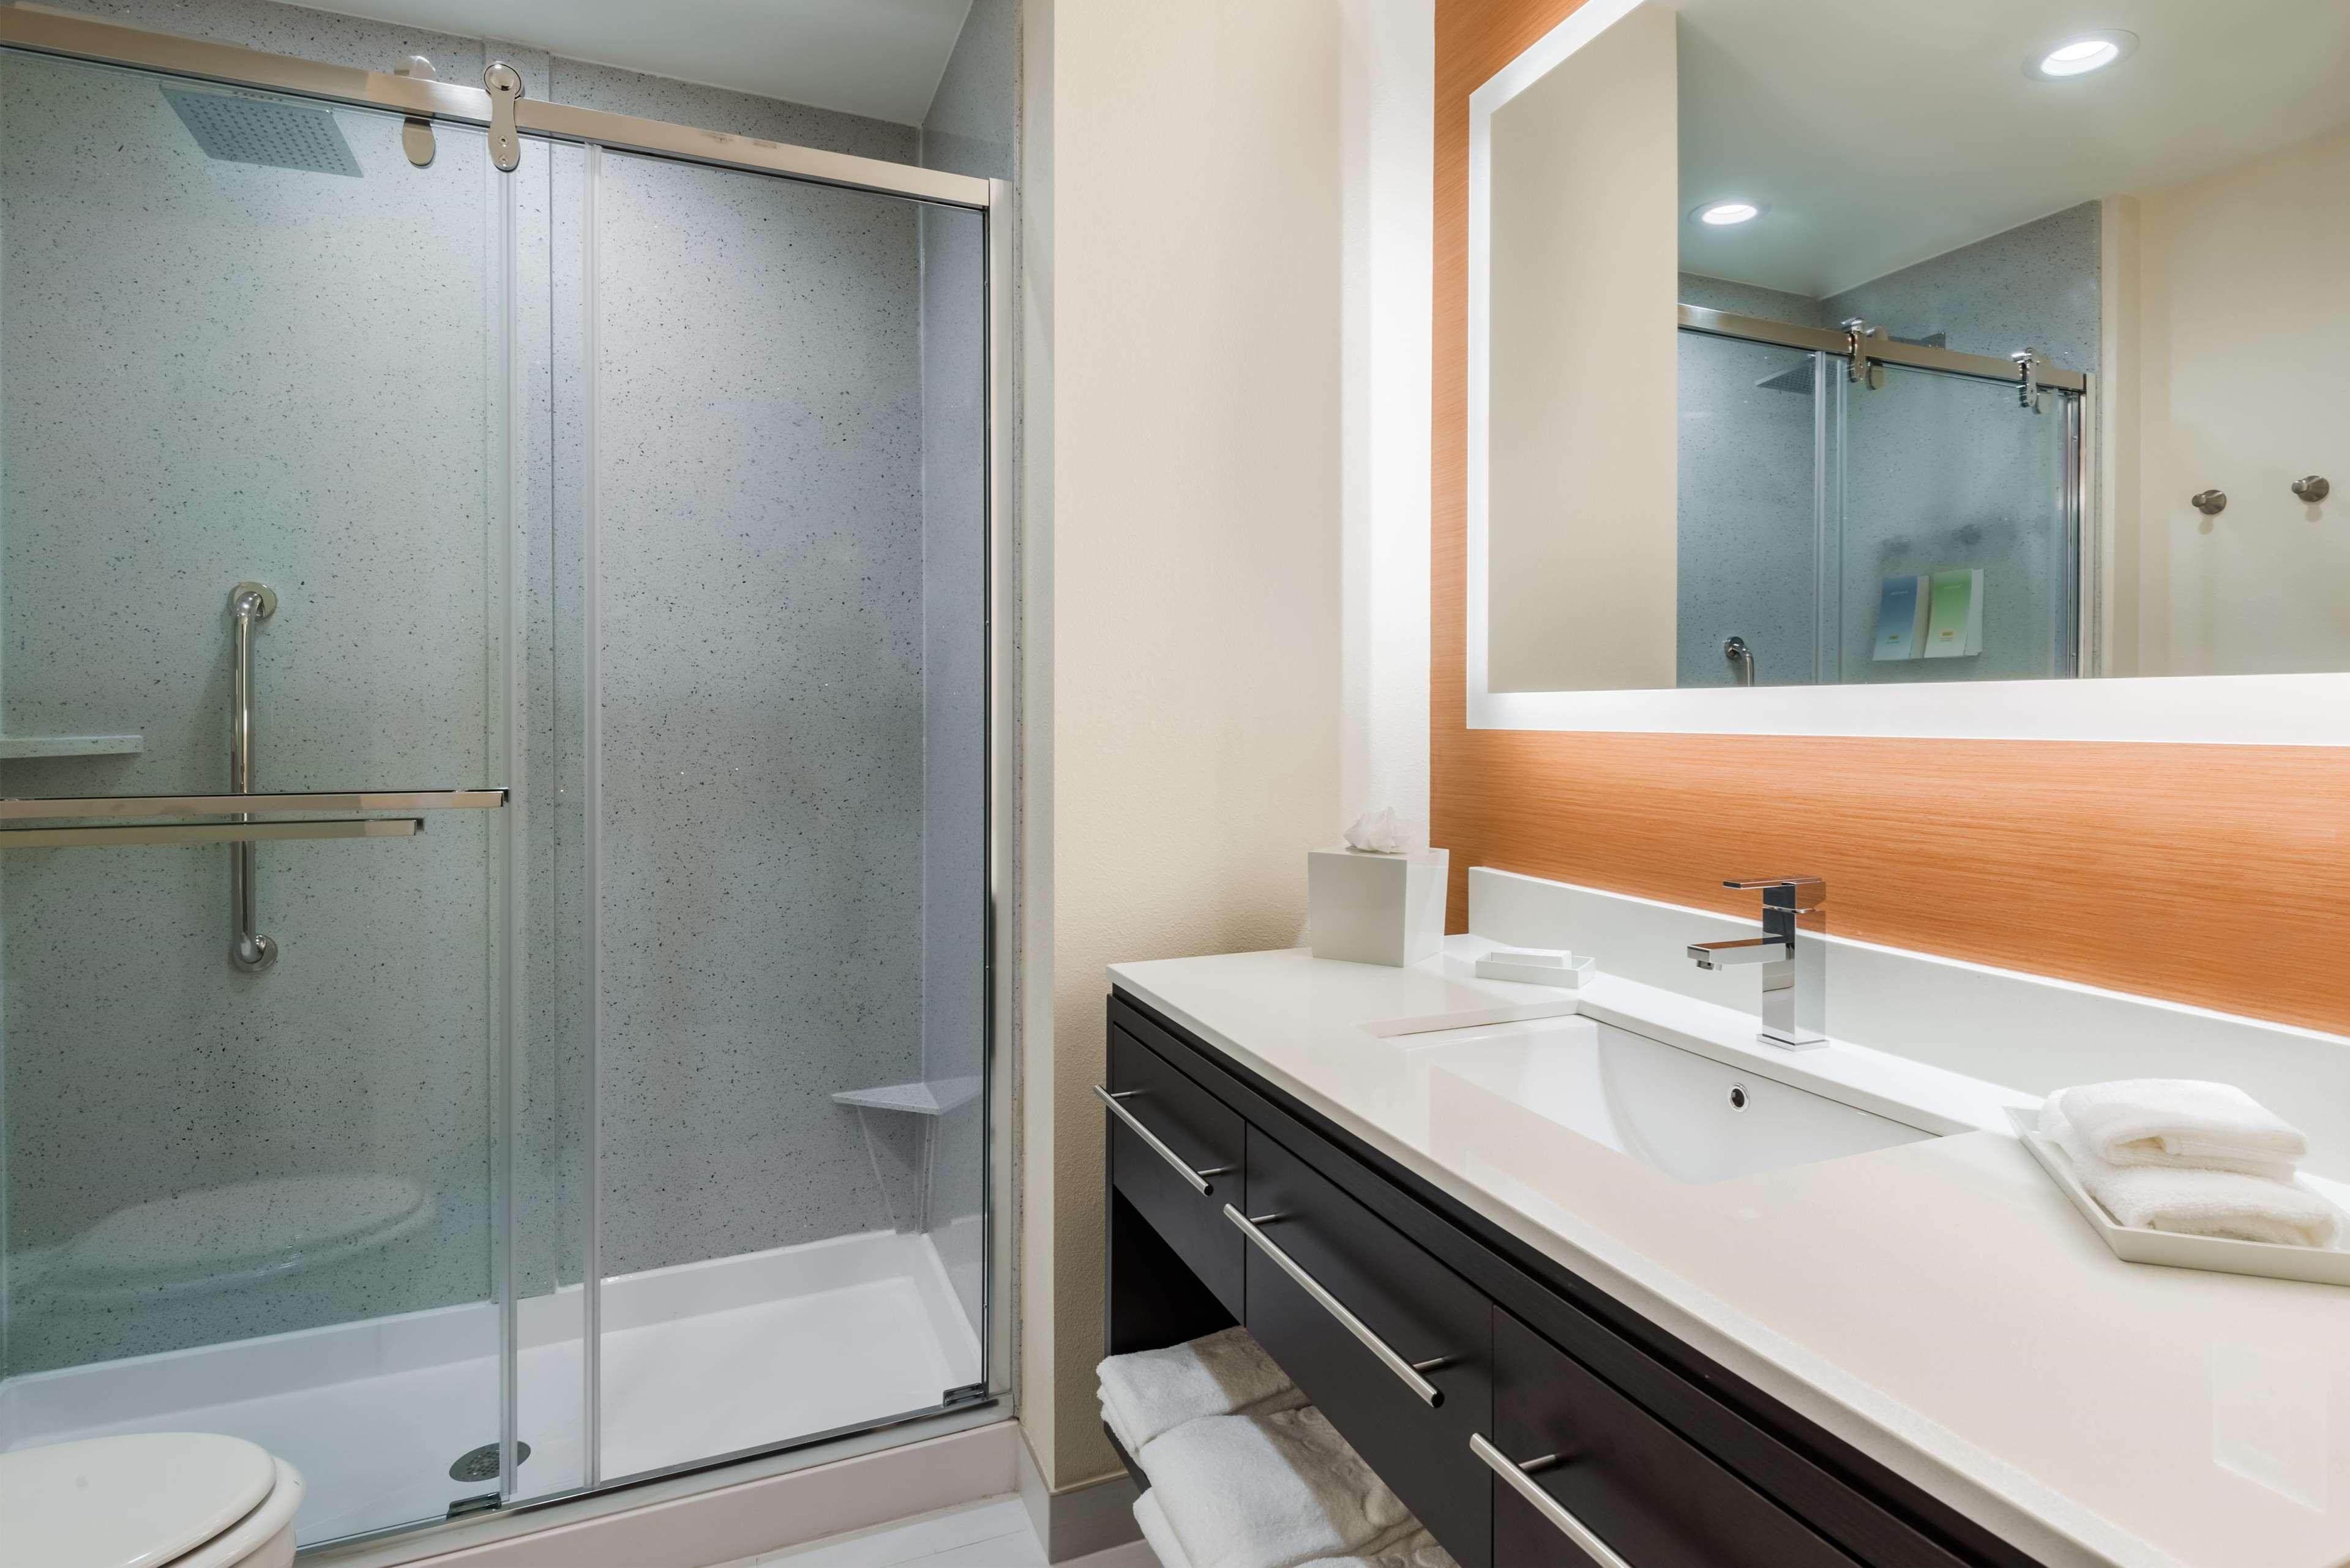 Home2 Suites by Hilton Atlanta Downtown image 18